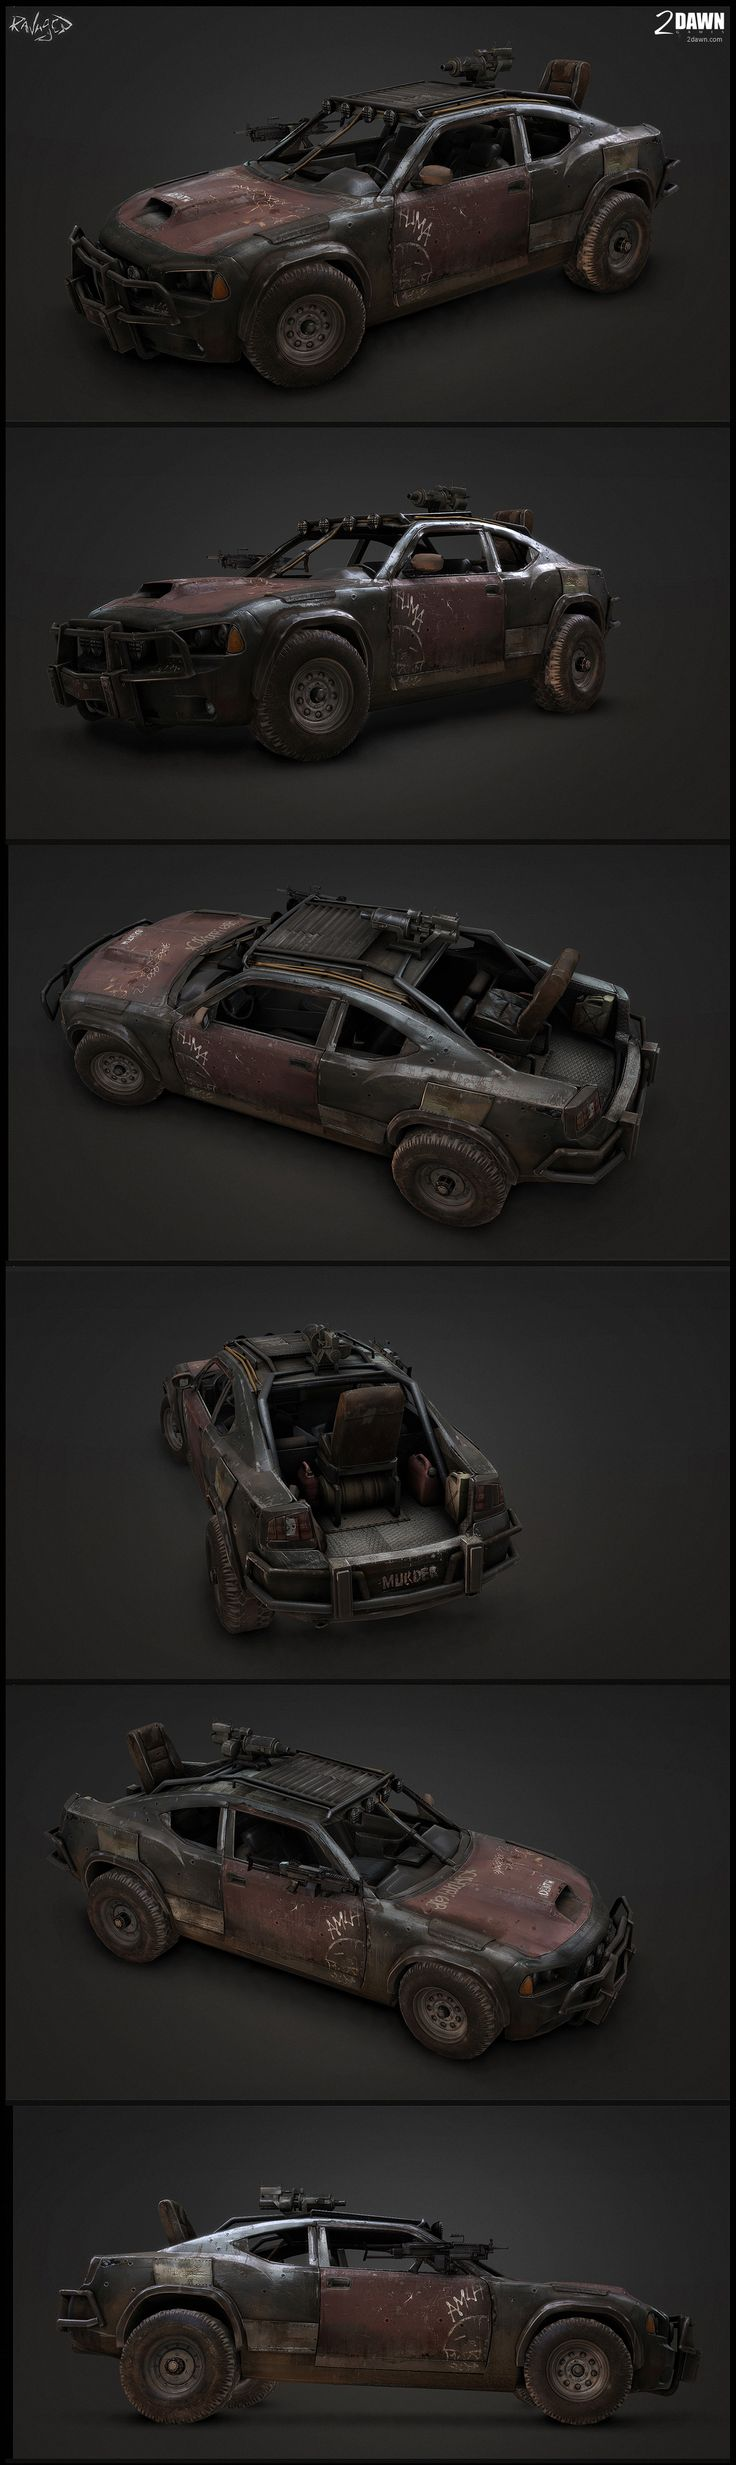 Vehículo táctico post-apocalíptico por Alan Van Ryzin / Post-apocaliptic tactical vehicle by Alan Van Ryzin